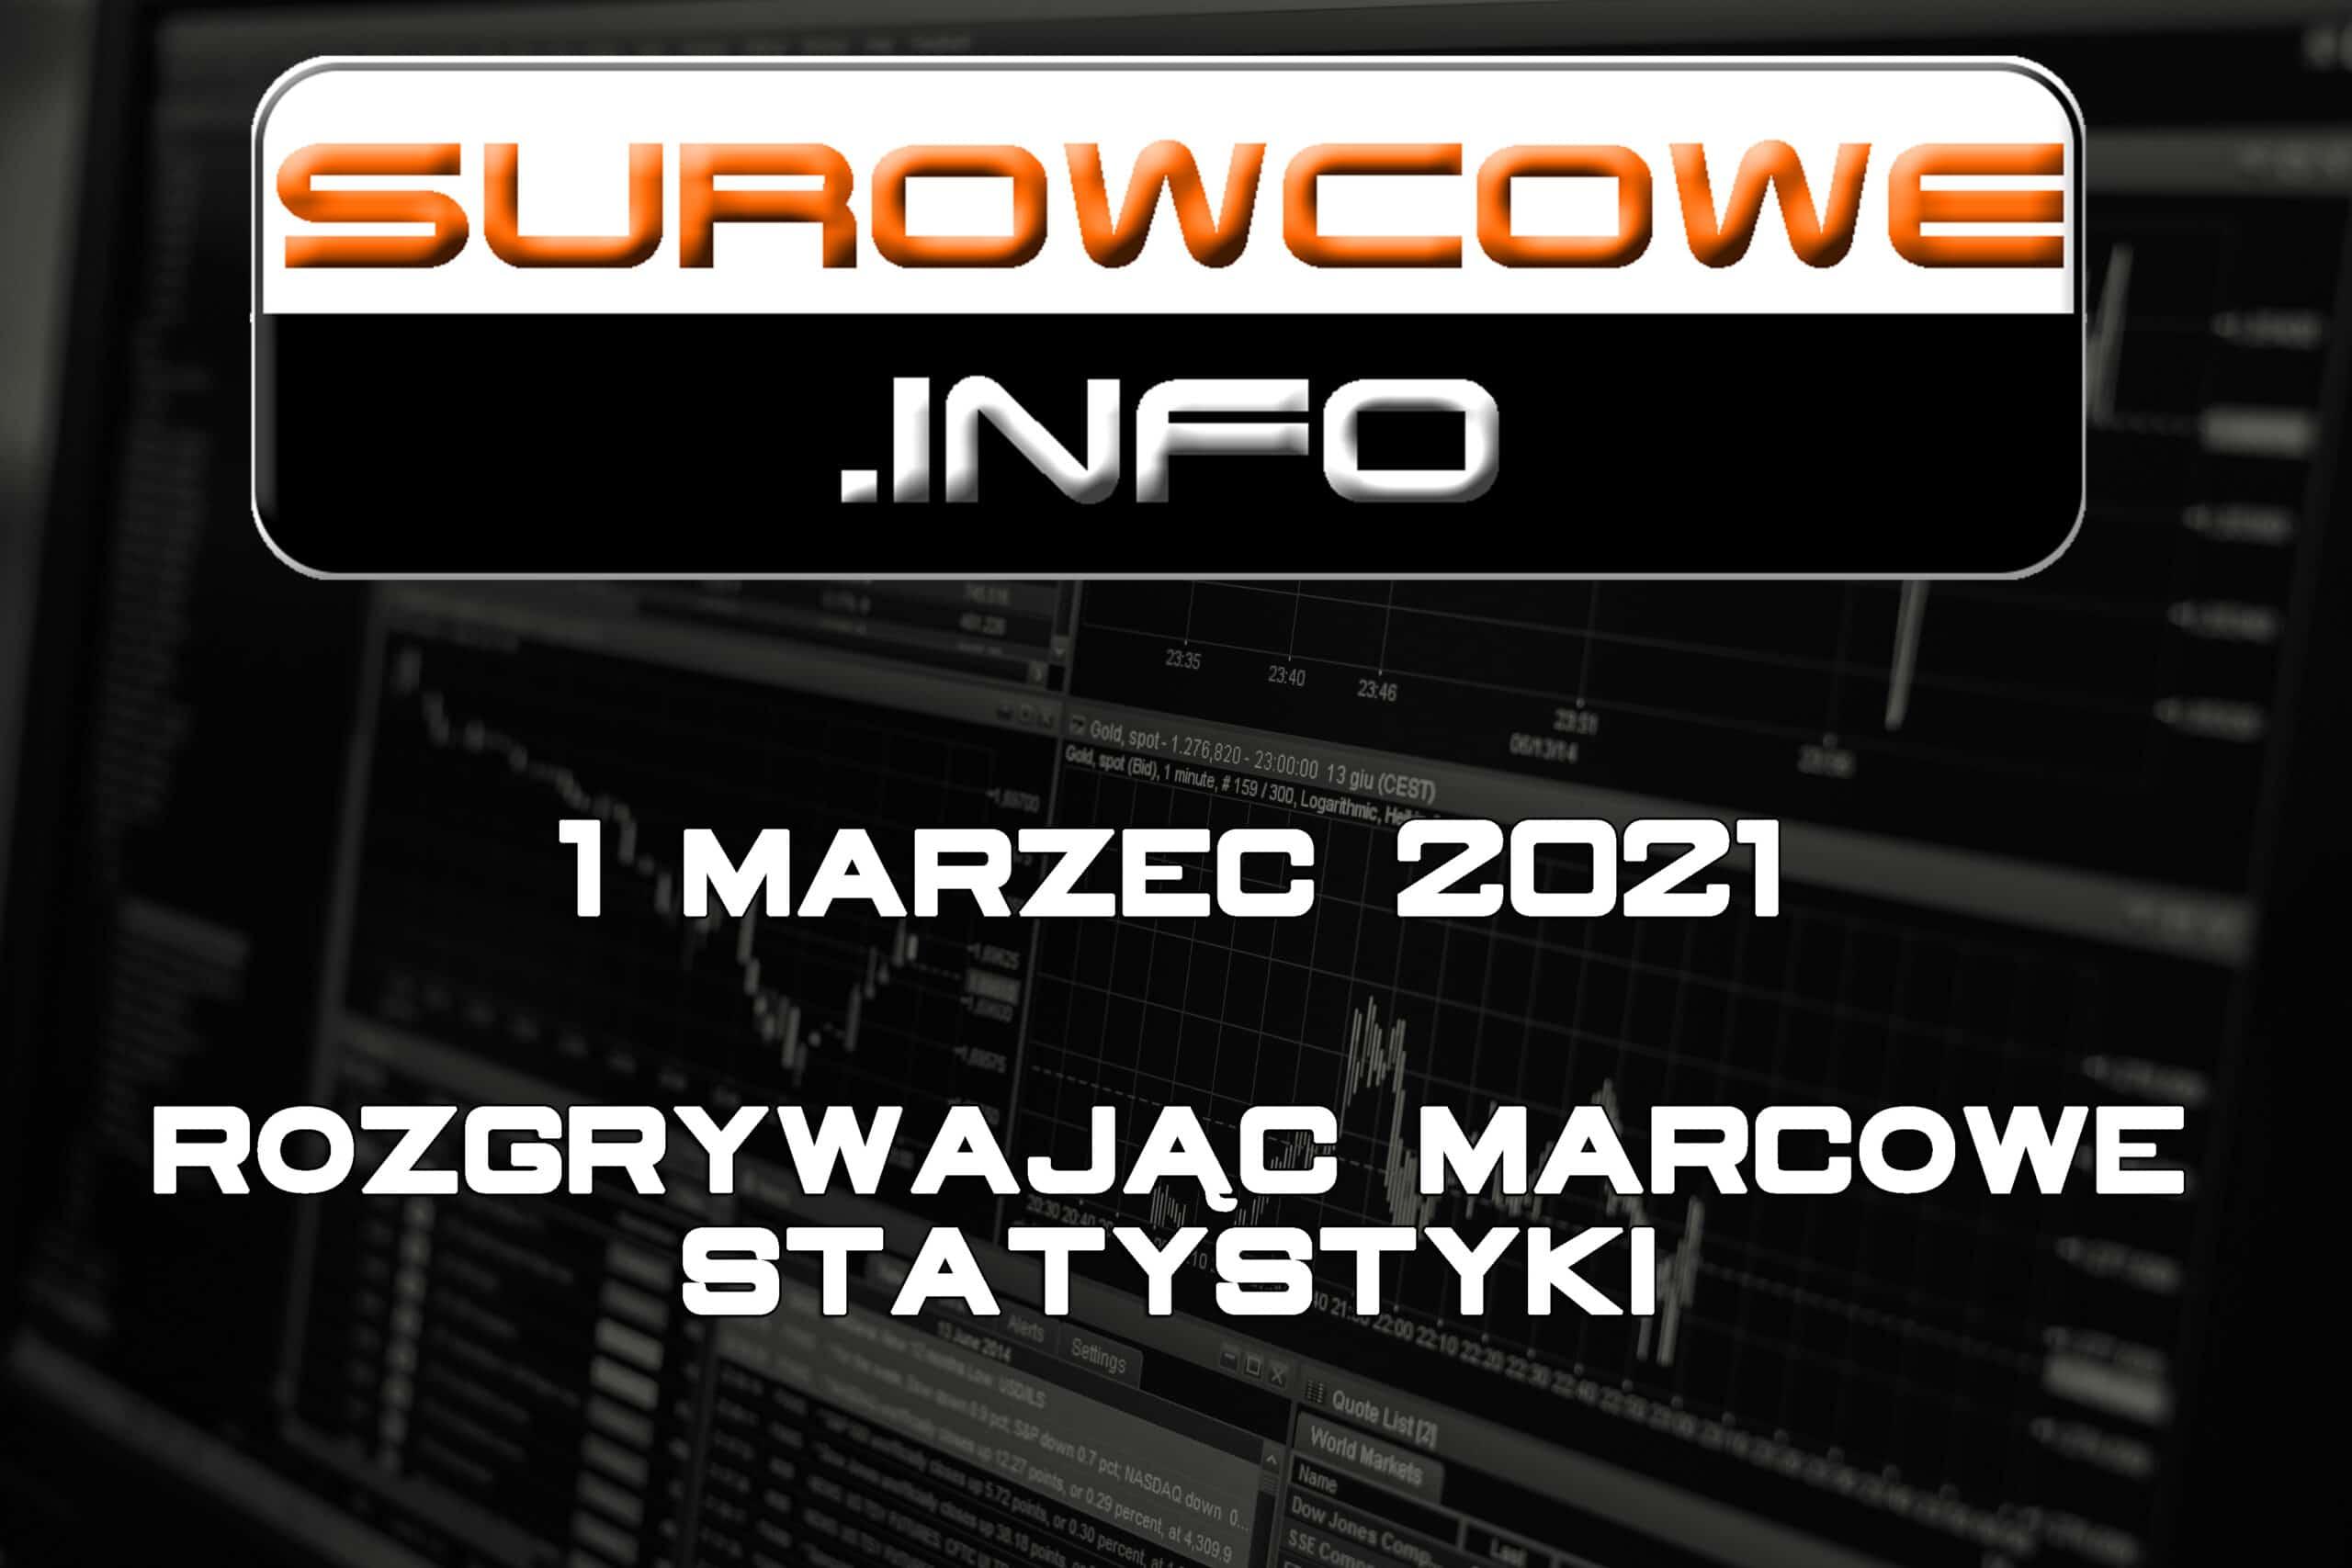 Surowcowe.info 1 marzec 2021